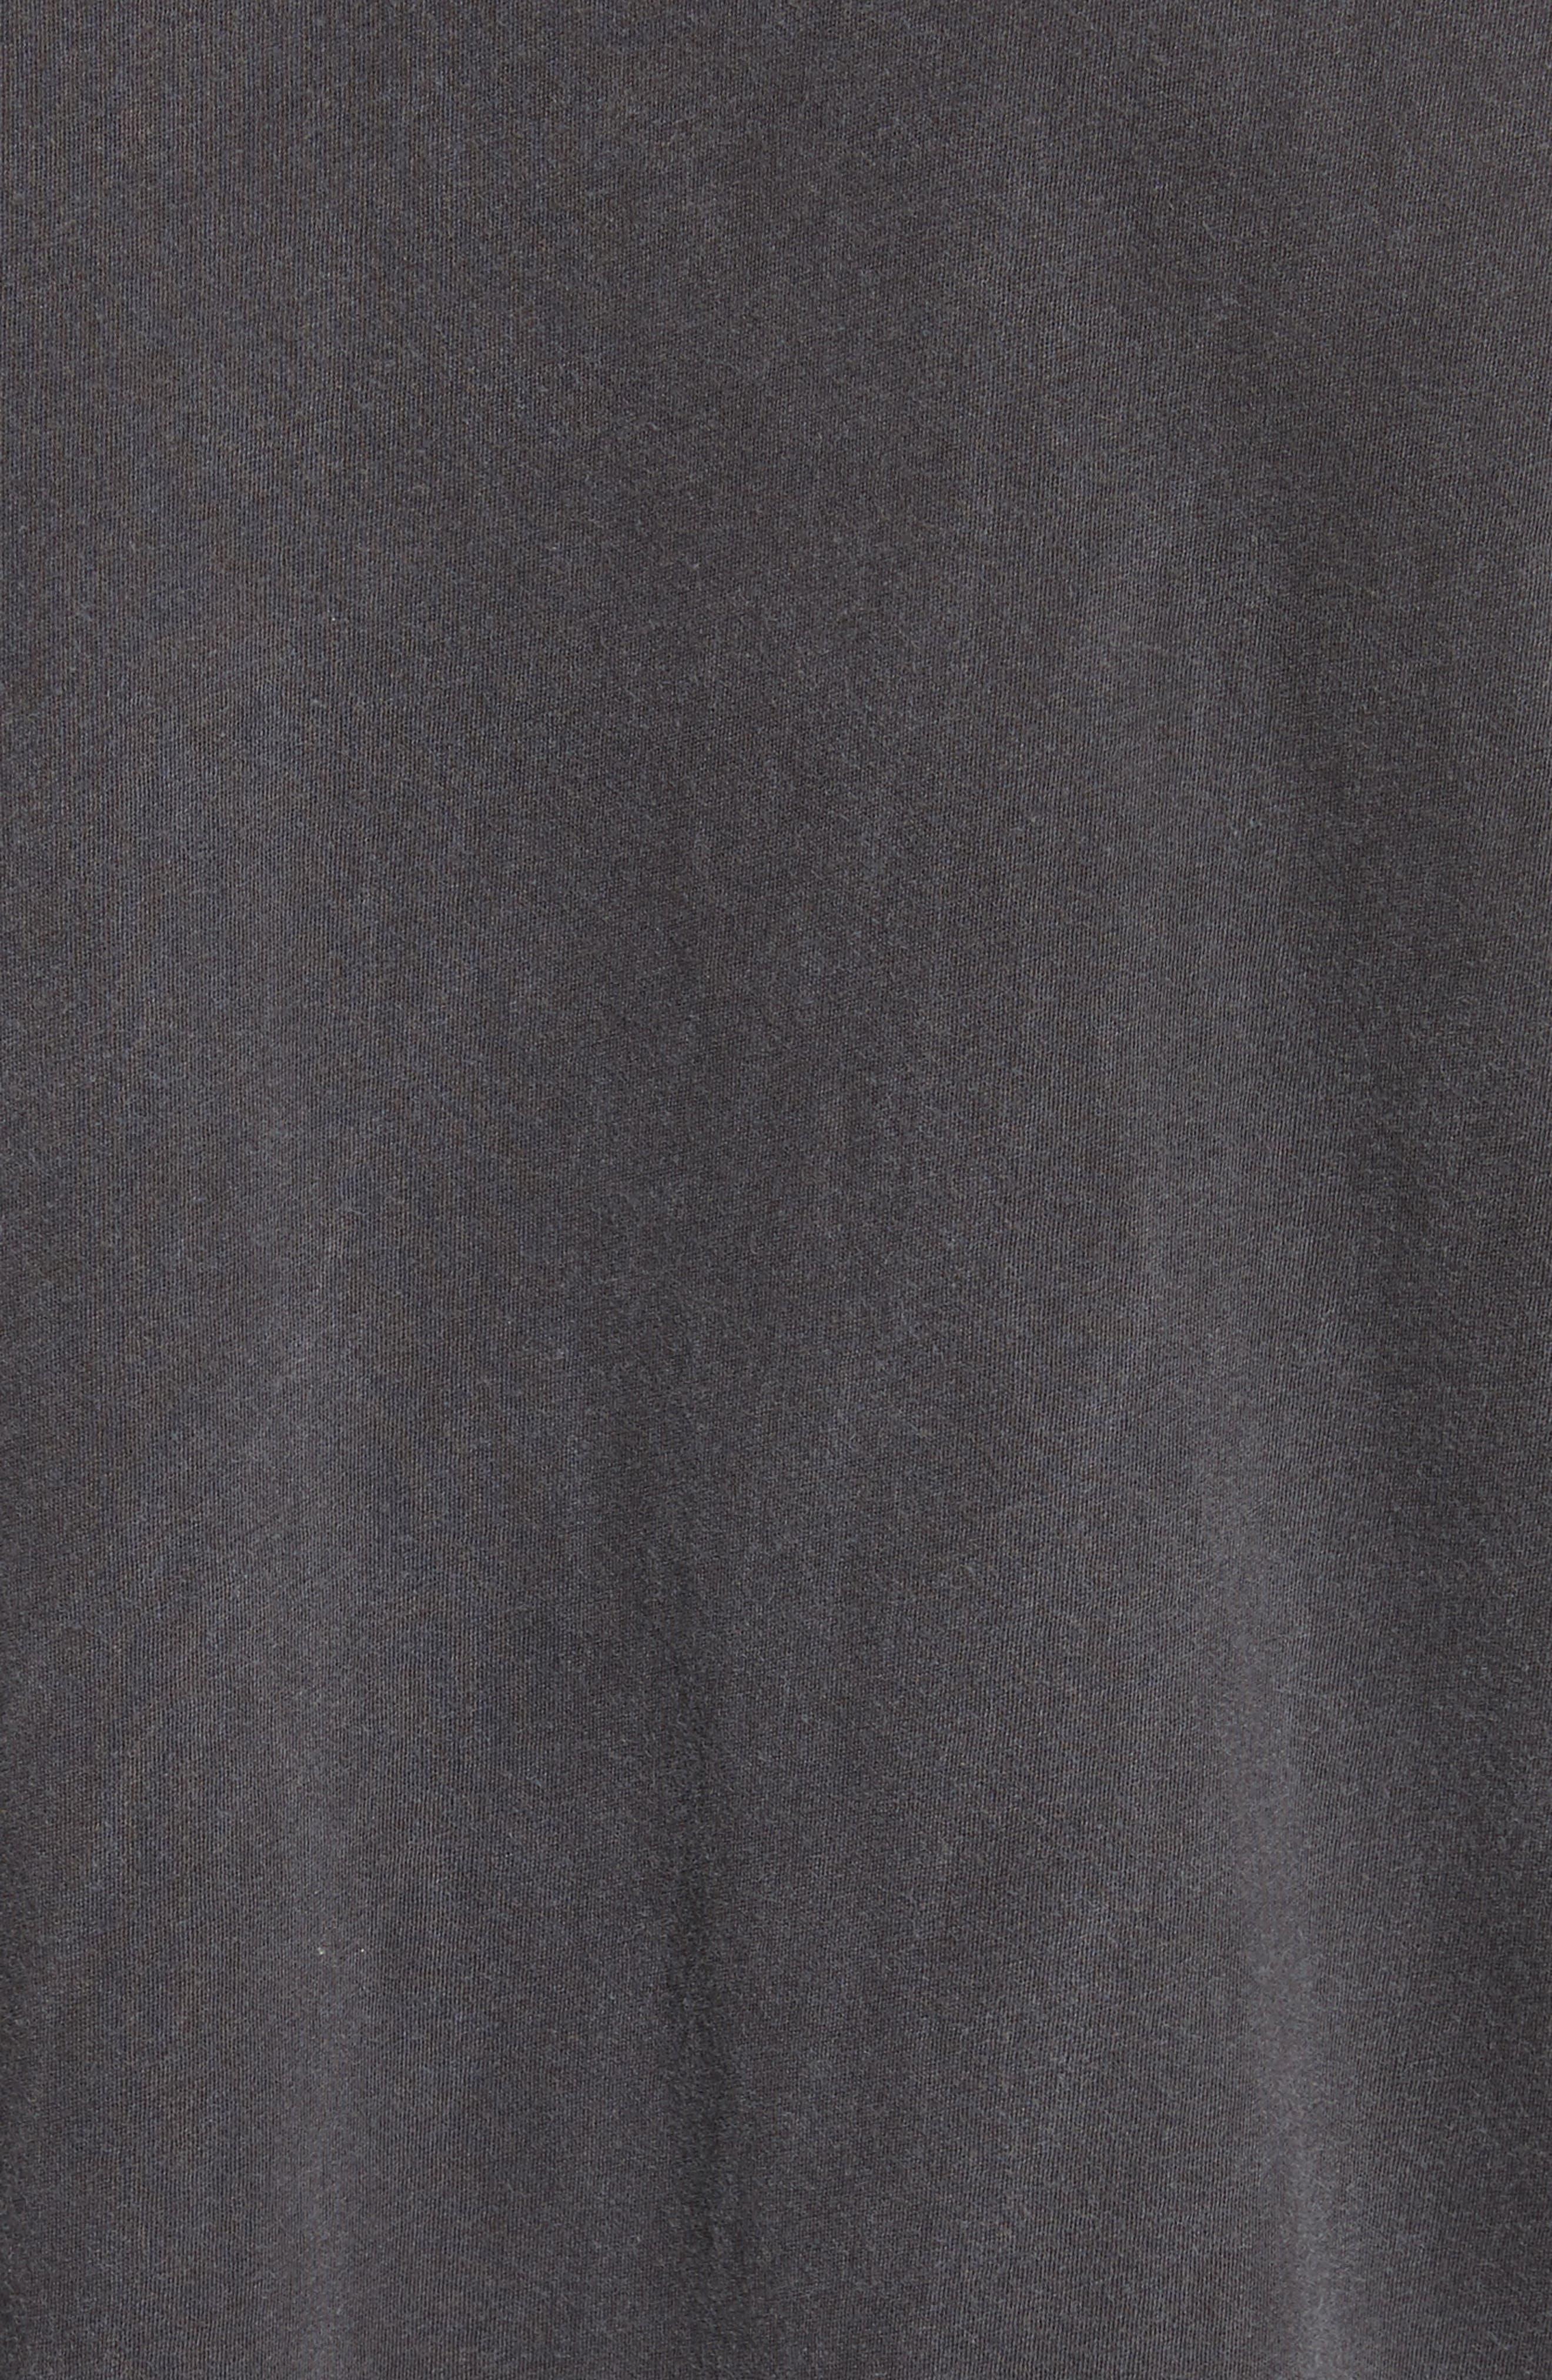 Alternate Image 5  - Drifter Cobain Distressed Oversize T-Shirt